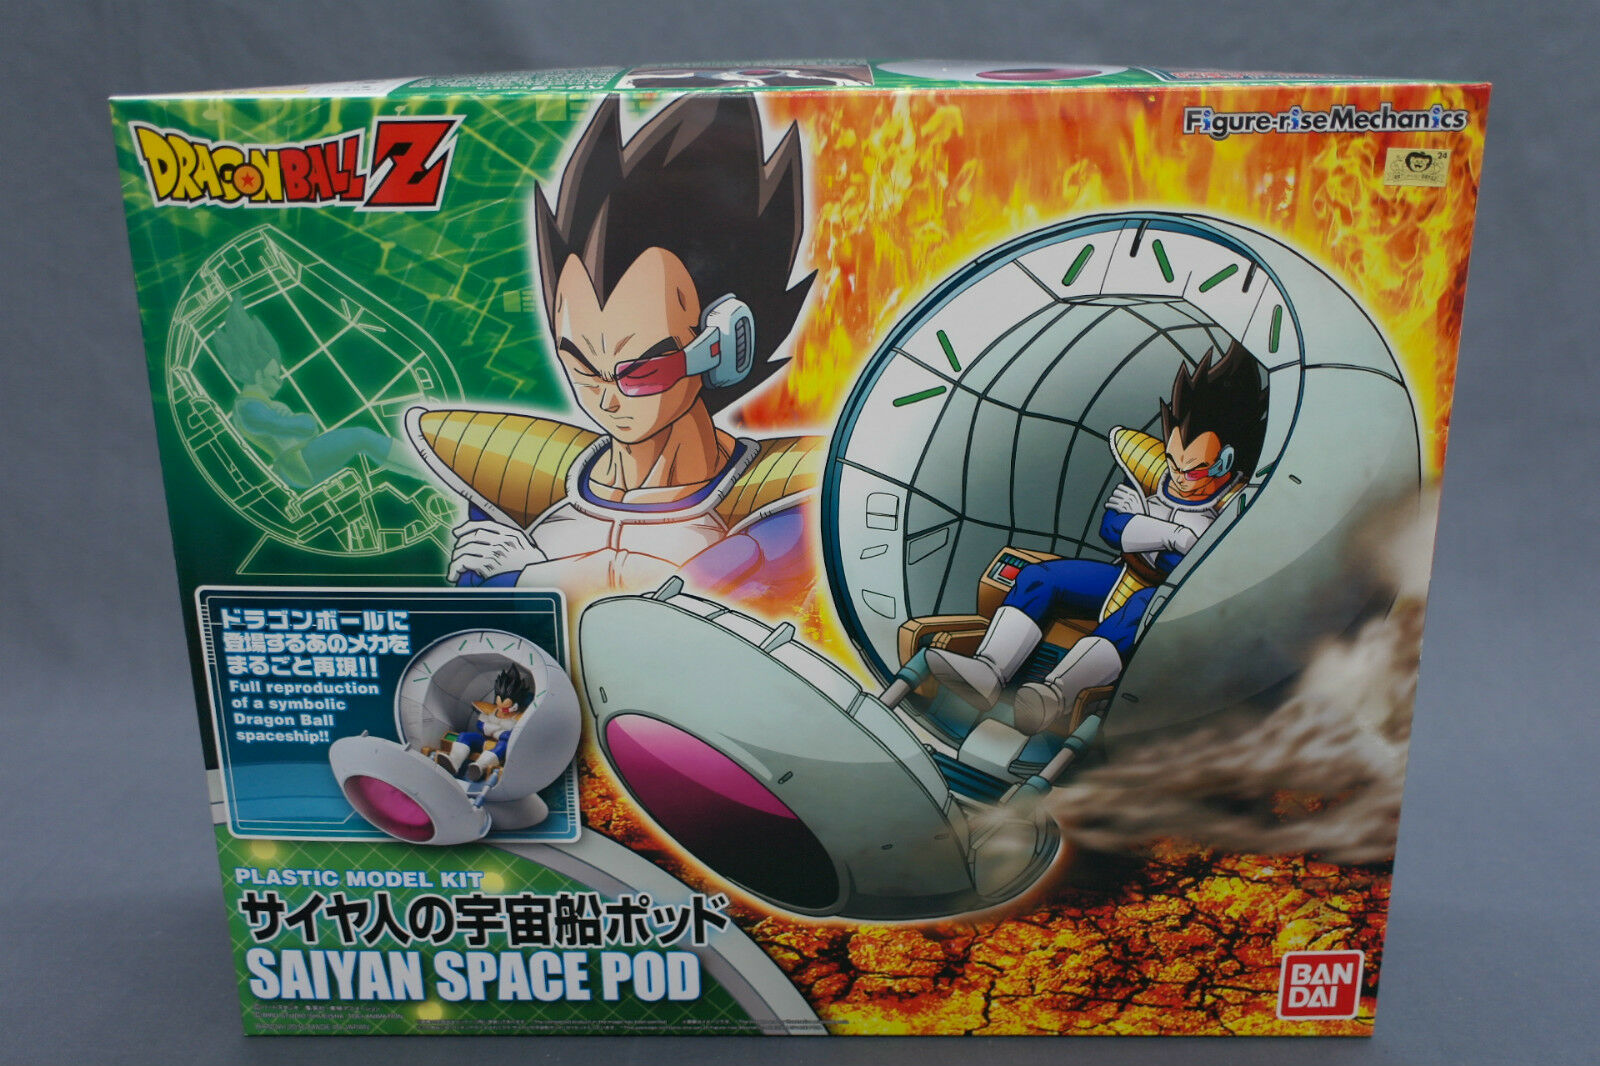 Figure-rise Mechanics Saiyan's Space ship Vegeta Pod Dragon Ball Z Bandai NEW